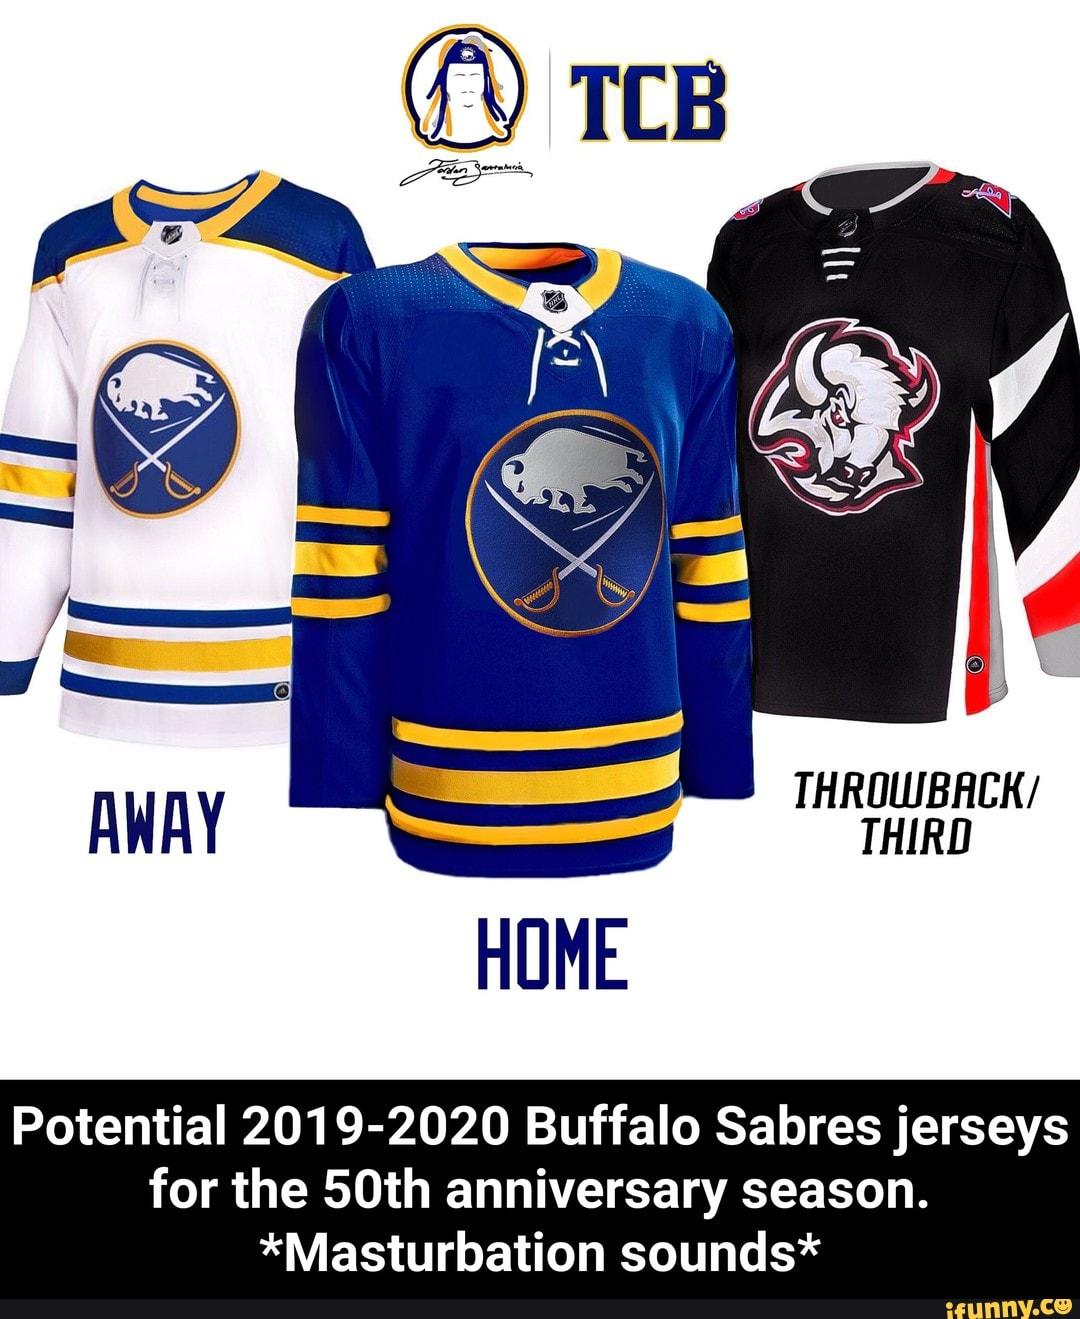 timeless design e2e59 b7a17 Potential 2019-2020 Buffalo Sabres jerseys for the 50th ...